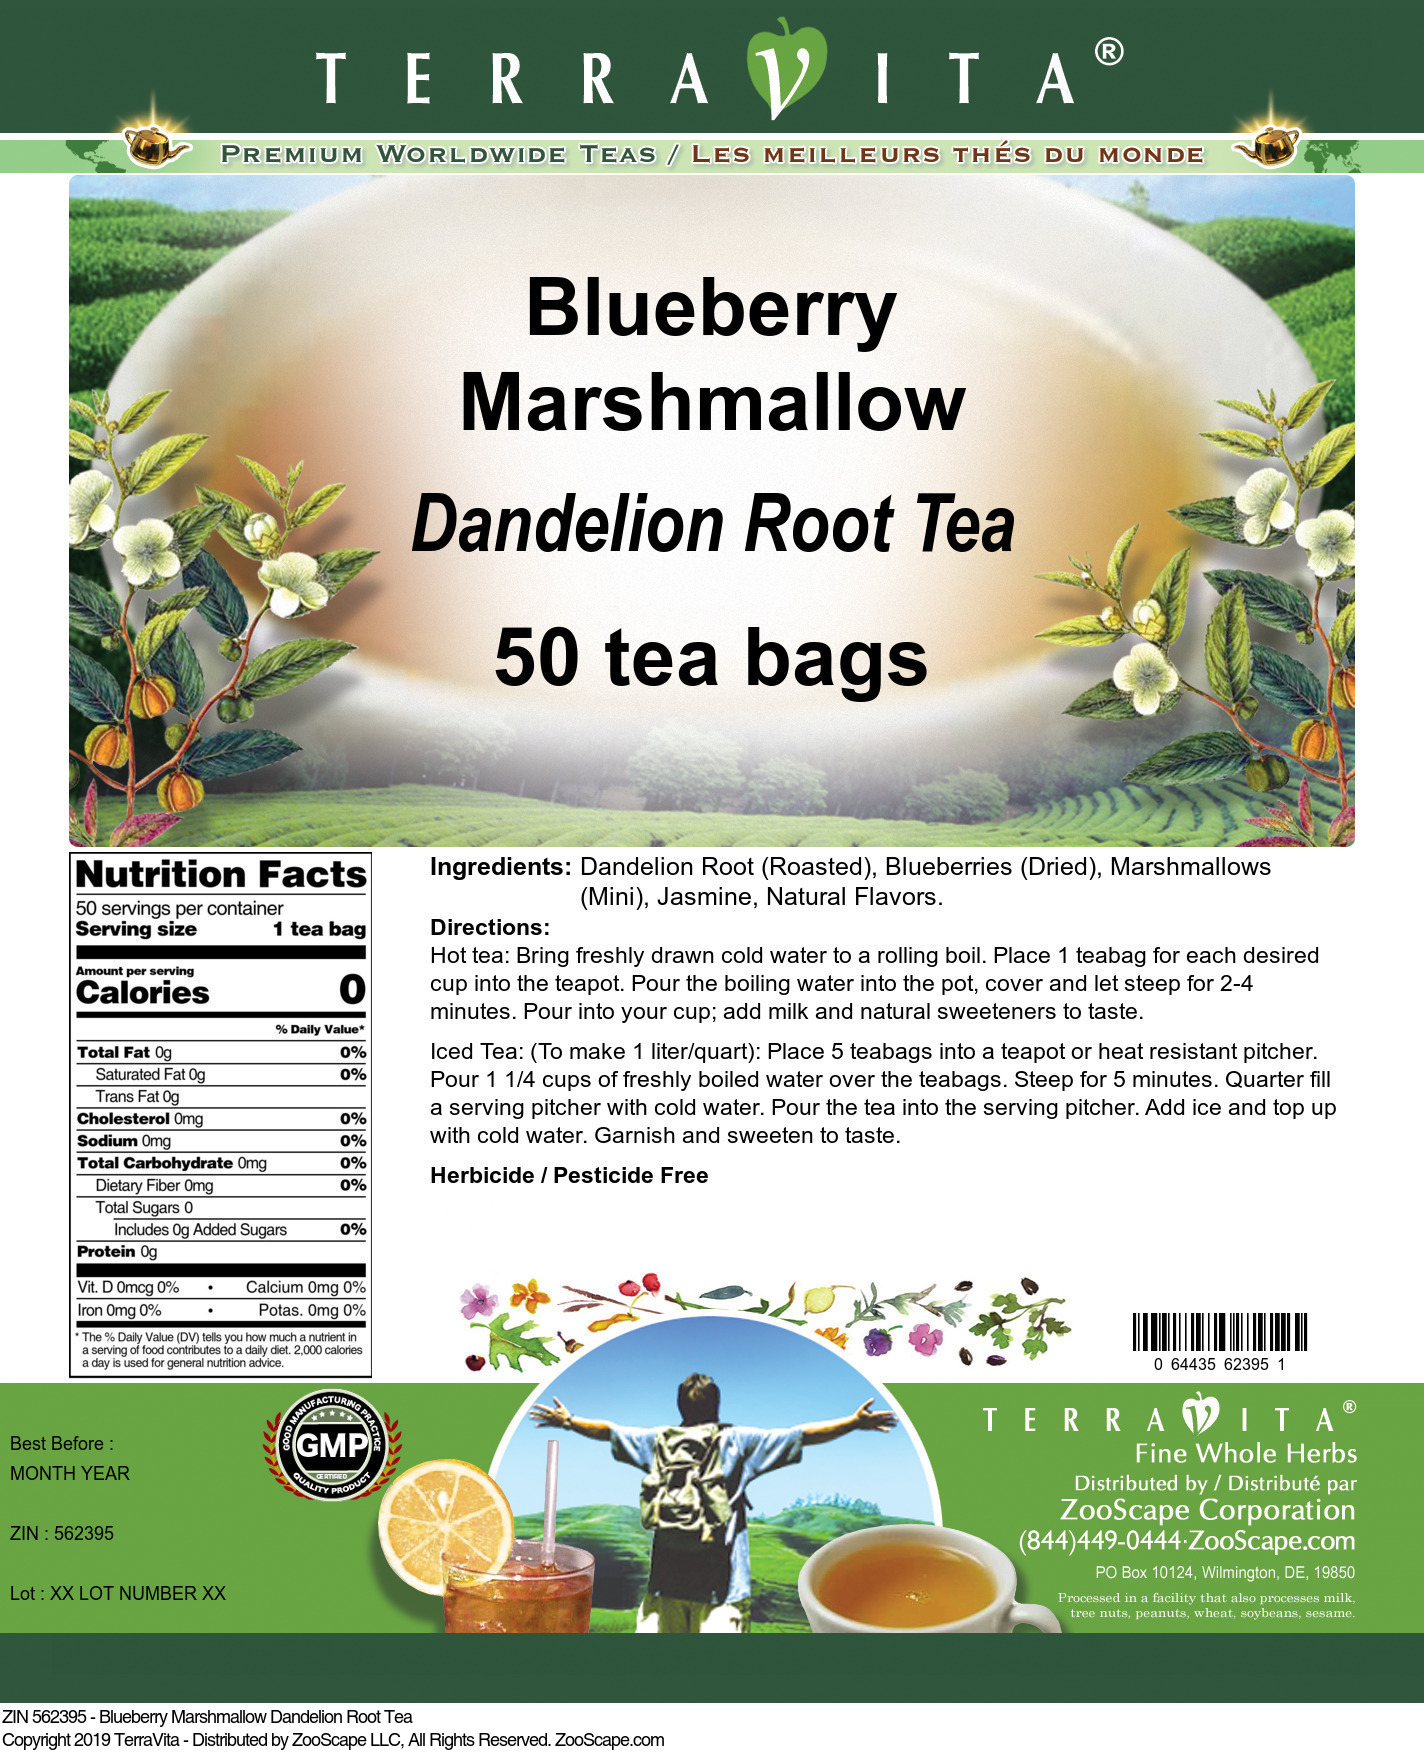 Blueberry Marshmallow Dandelion Root Tea